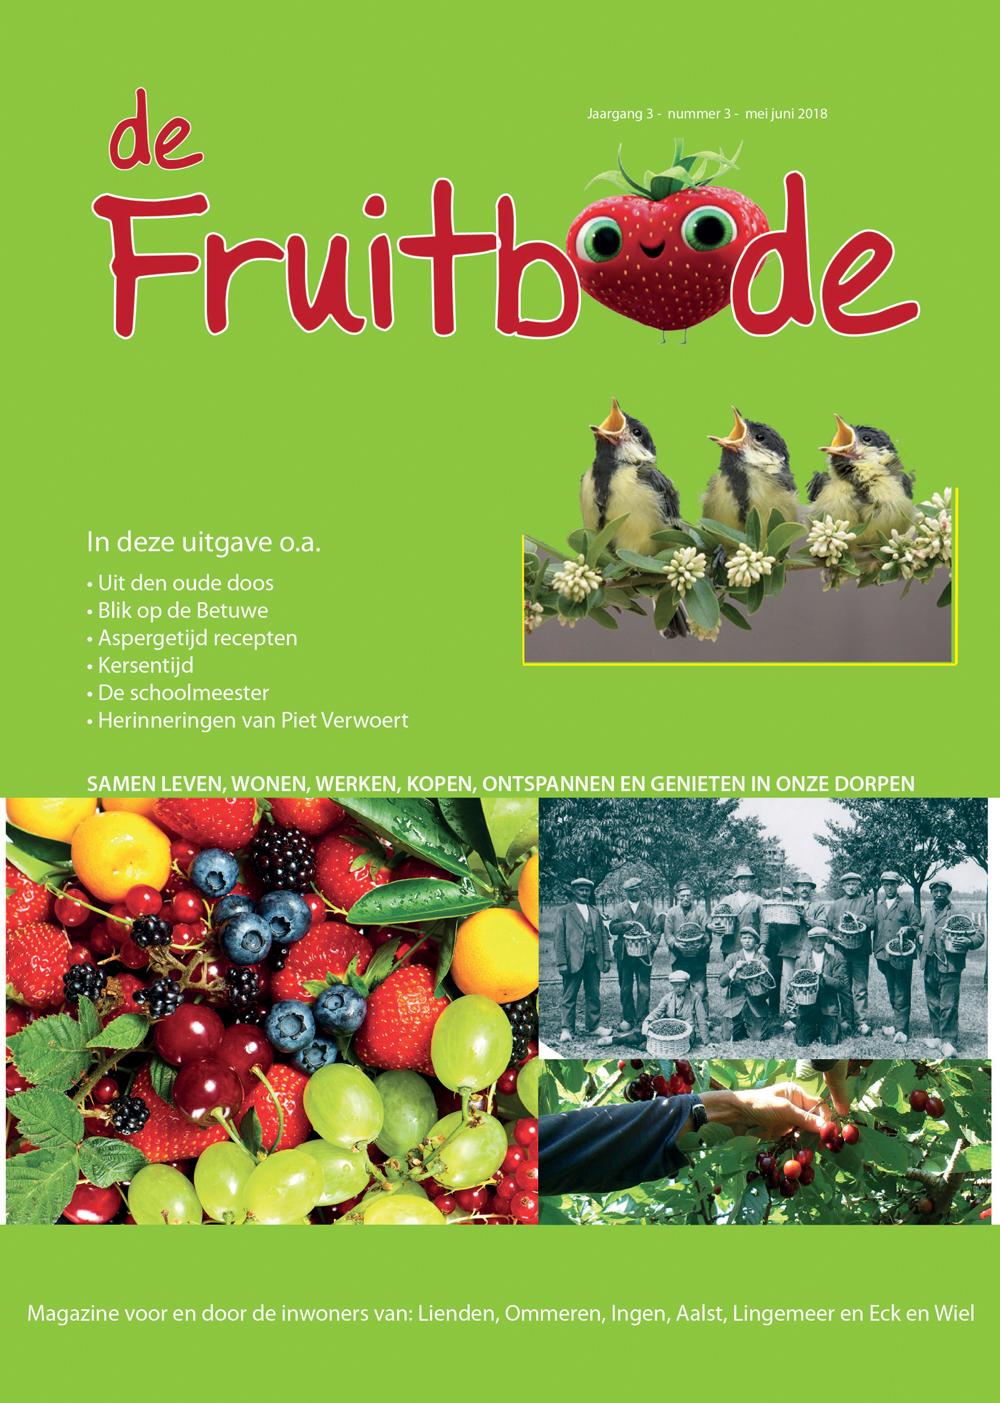 Fruitbode mei 2018